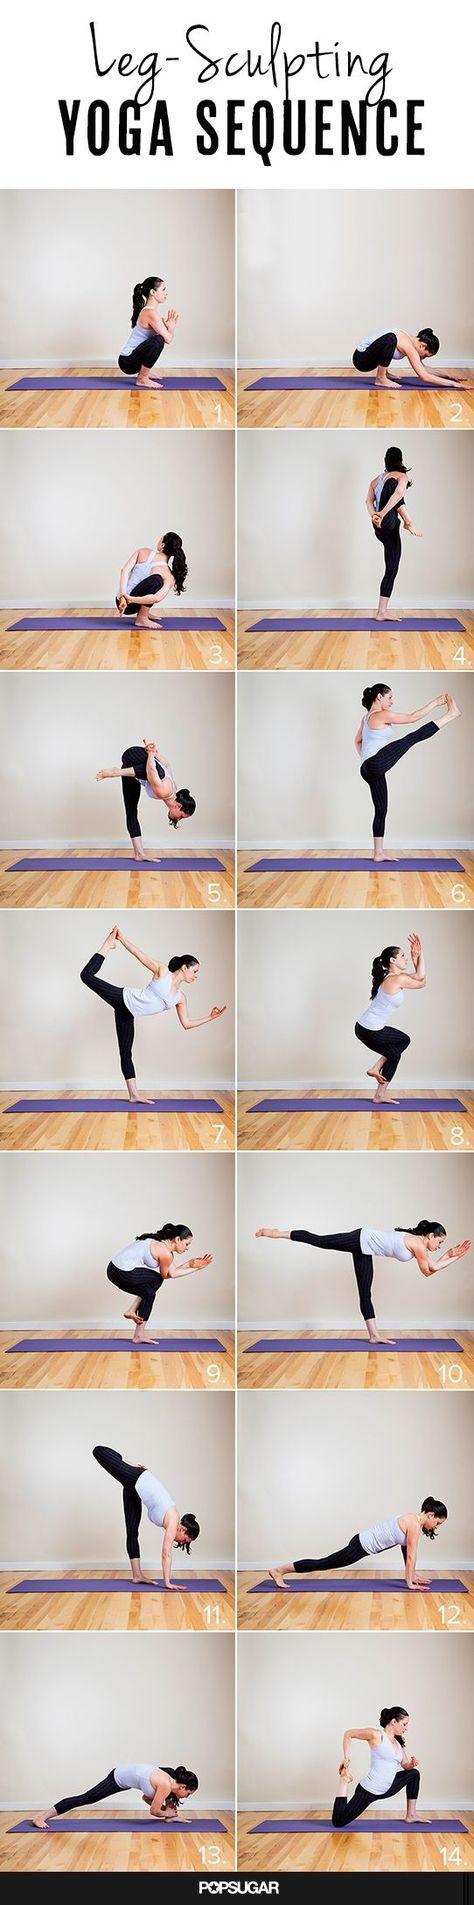 Leg Sculpting Yoga Sequence